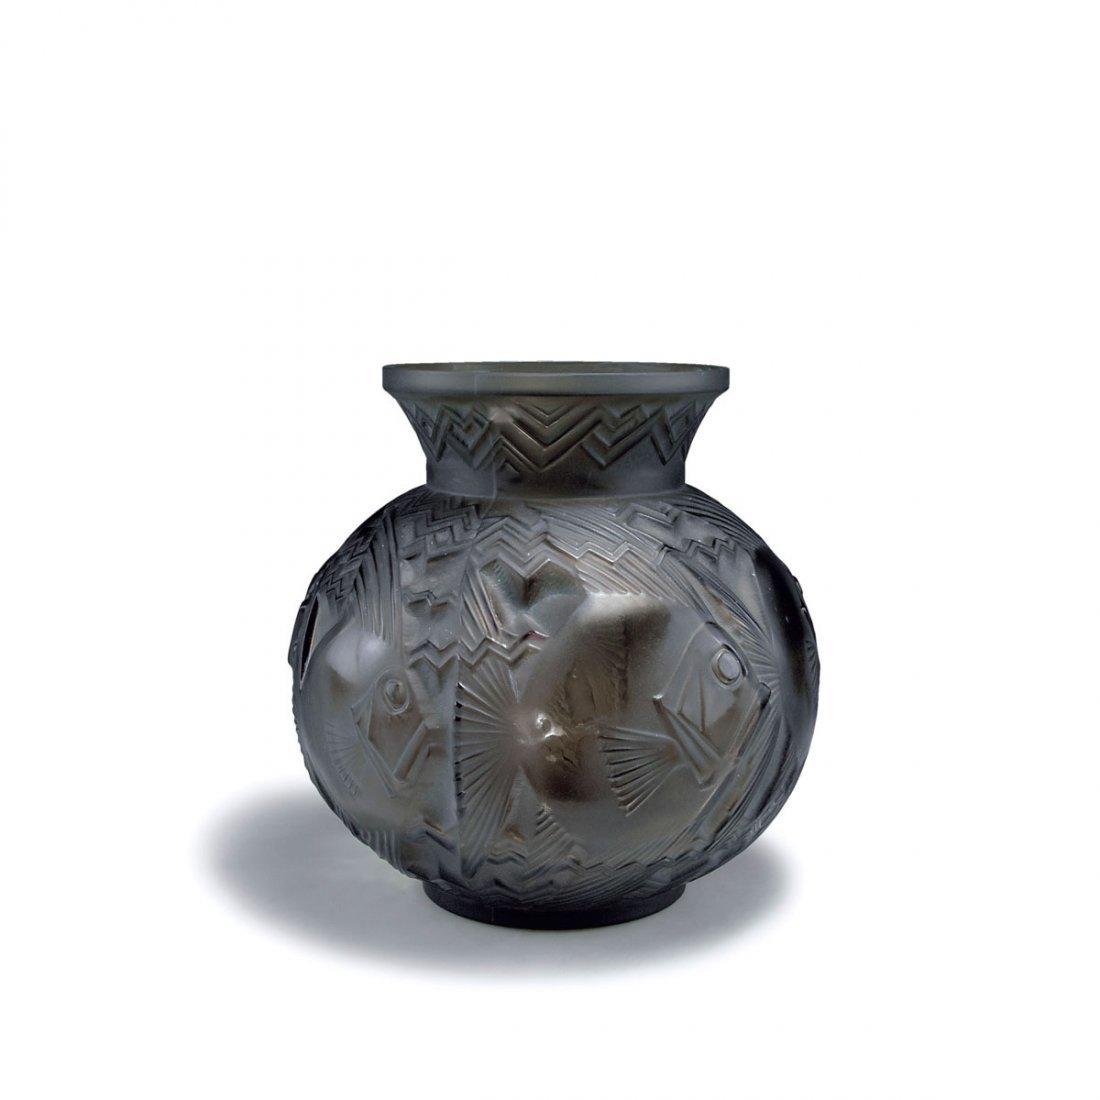 'Poissons Saint-Pierre' vase, c1930